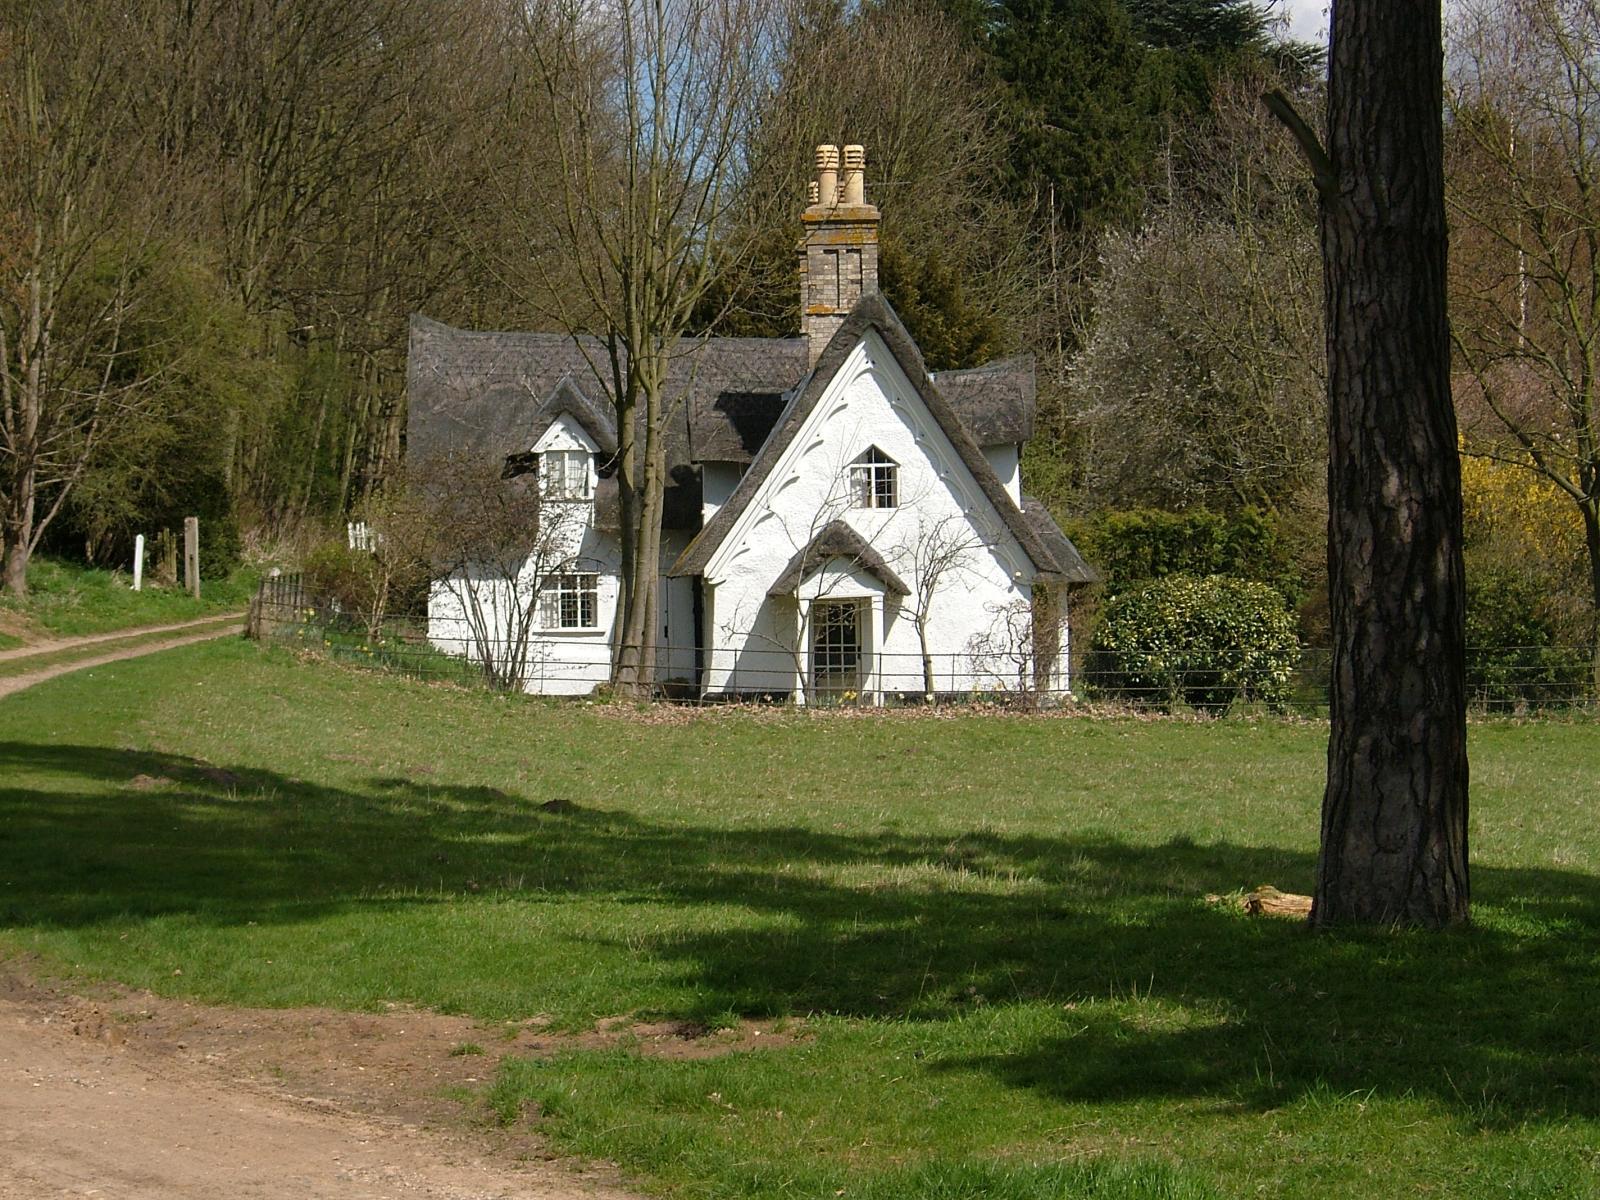 Ickworth_Park_-Suffolk,_England-17April2006.jpg